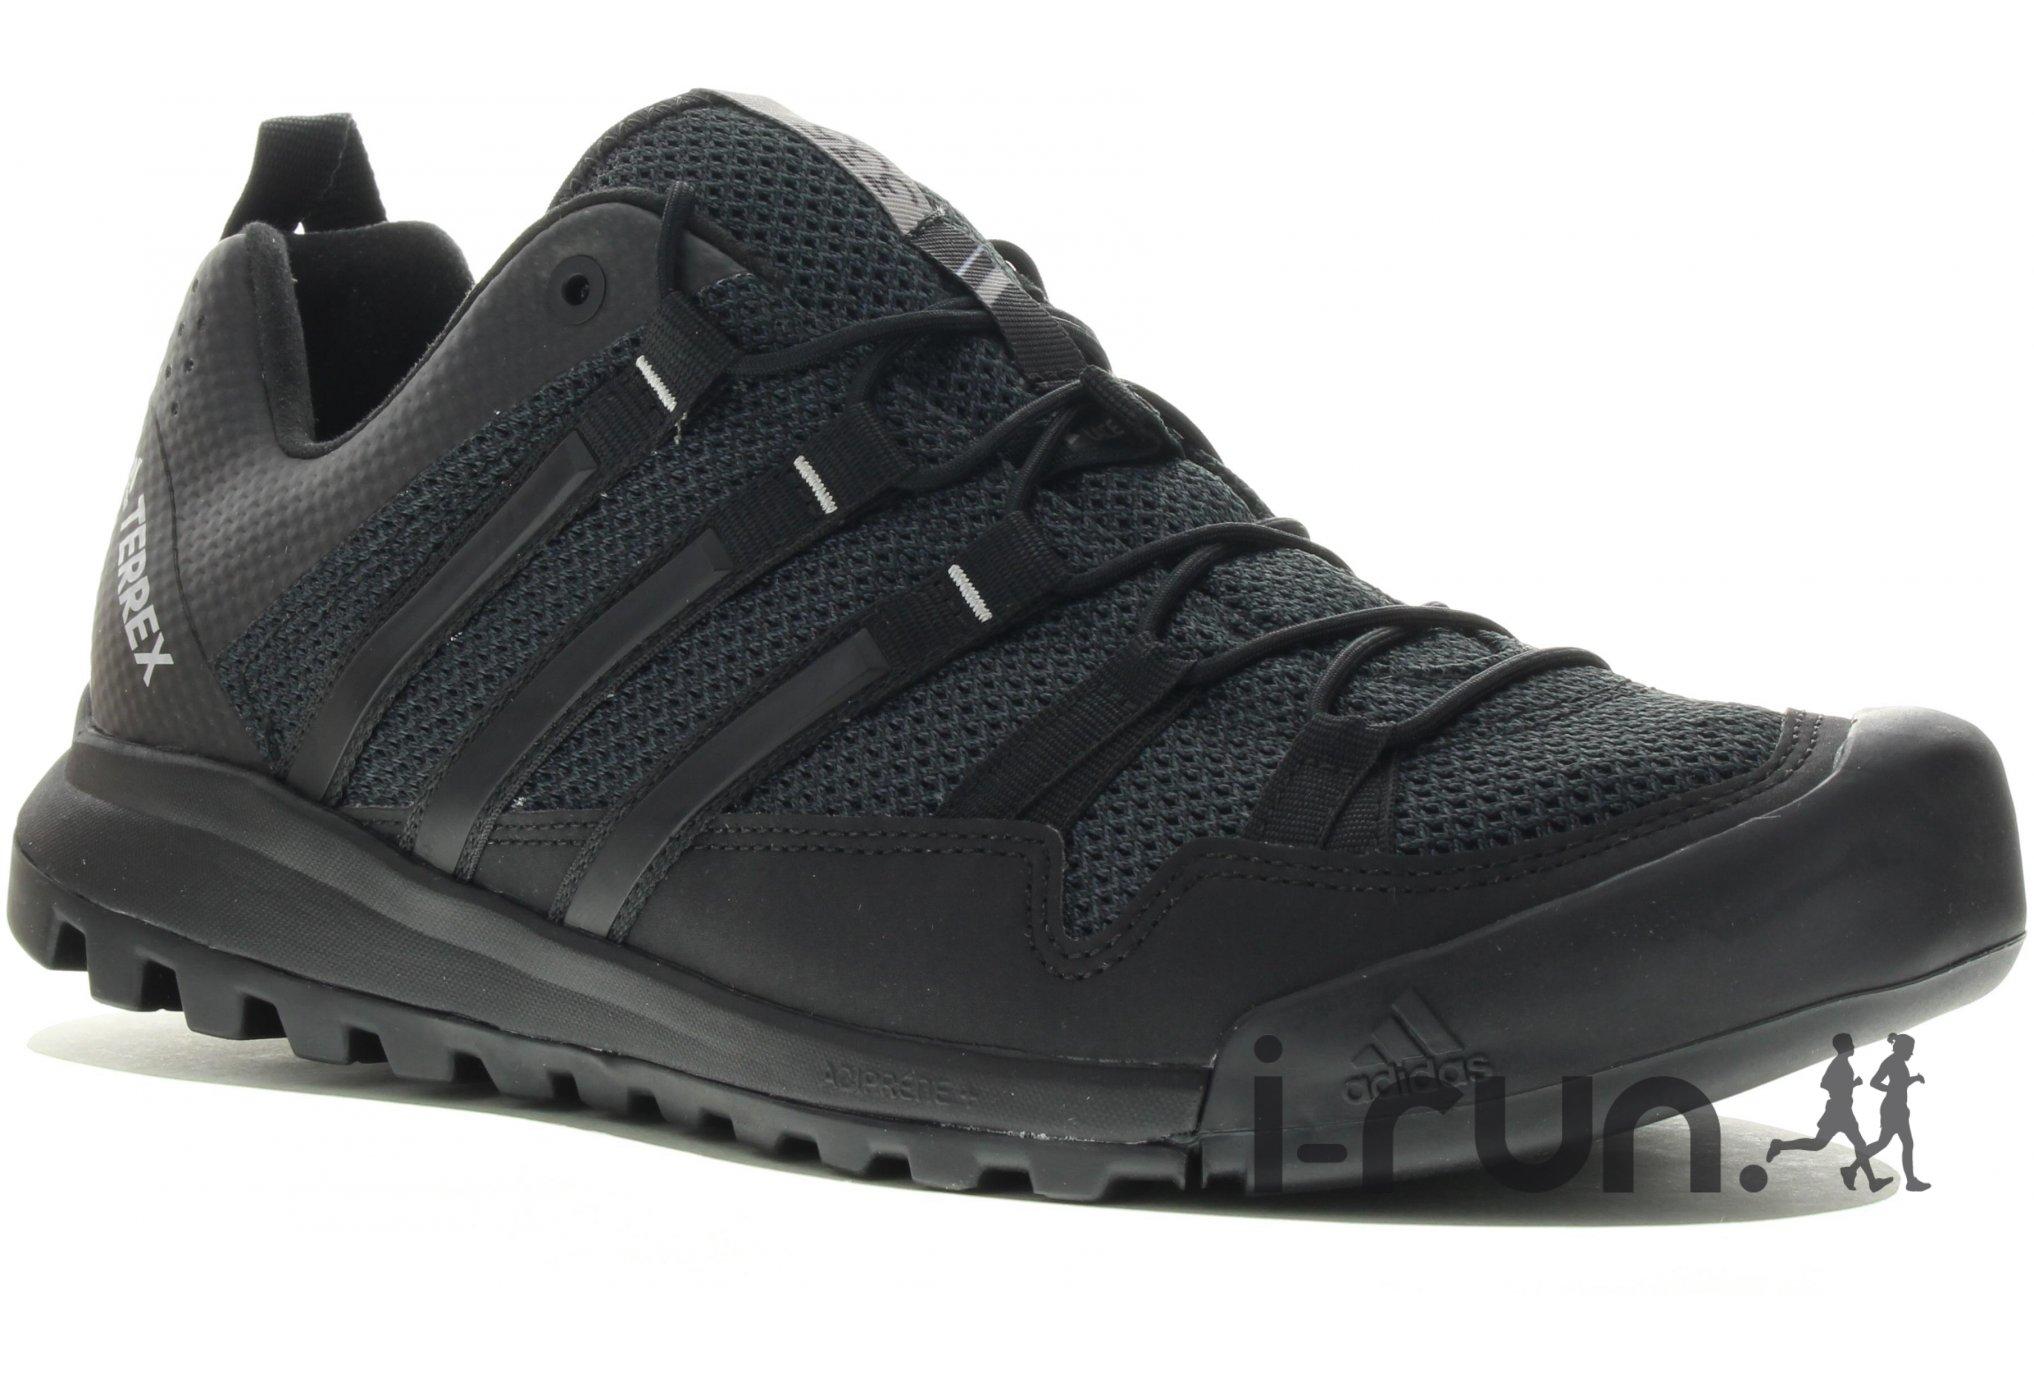 Homme Trail Terrex R2 Adidas Swift Gore Session Tex M Chaussures HWD29EI